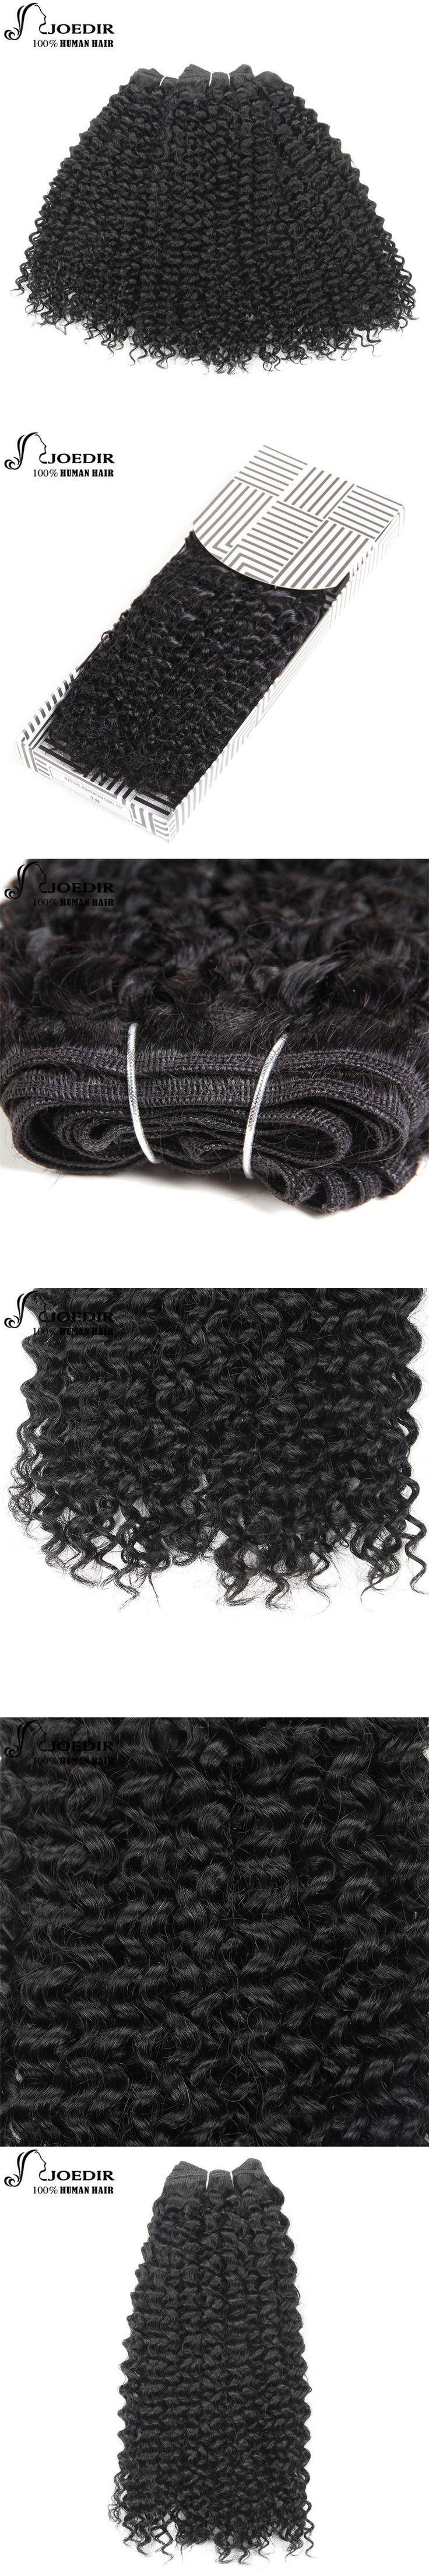 Joedir Pre-Colored Brazilian Remy Human Hair Weave Afro Kinky Curly Weave Human Hair Bundles Hair Natural 1B Color Free Shipping